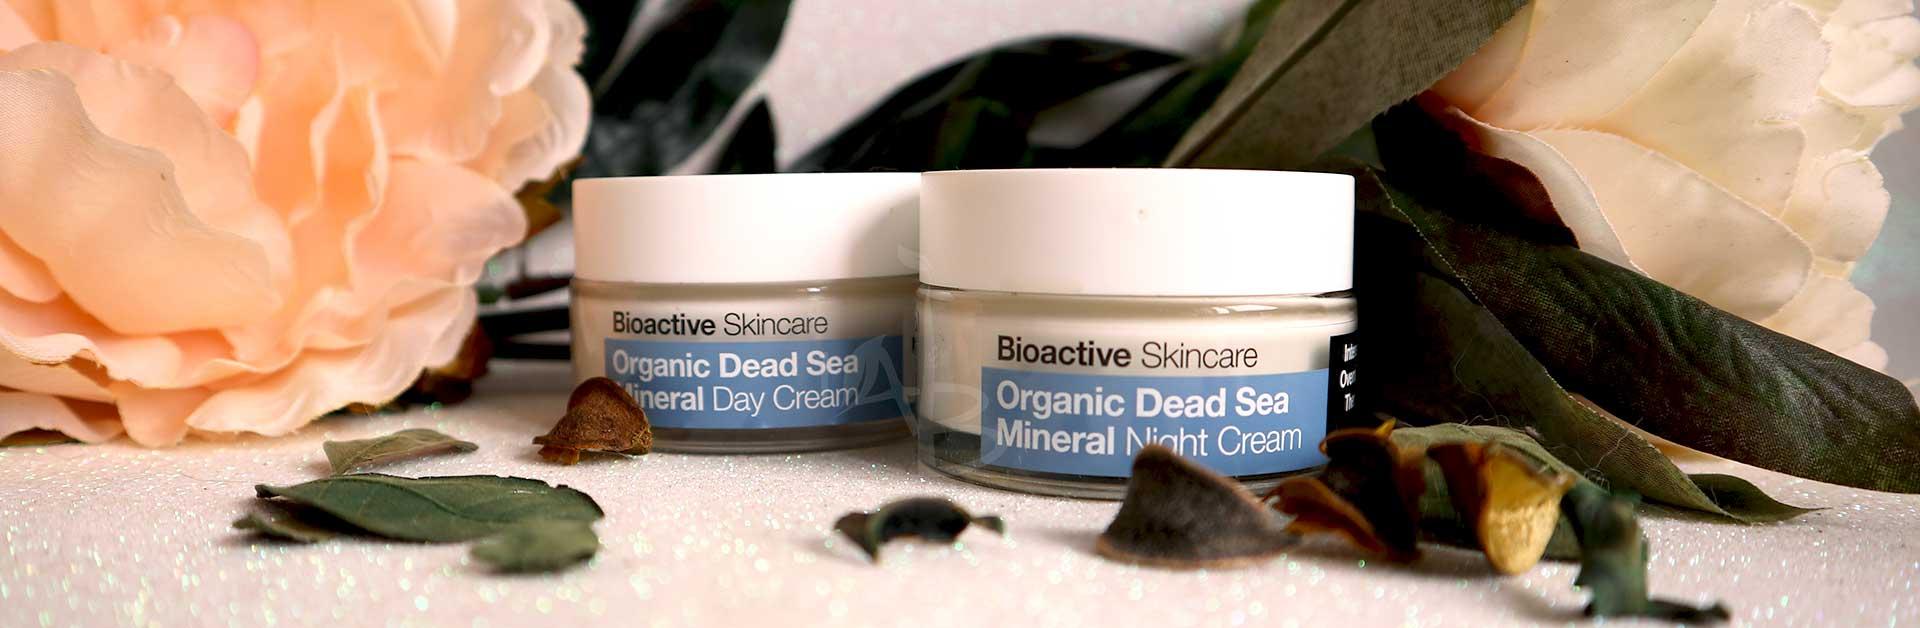 Creme viso organic dead sea Dr. Organic